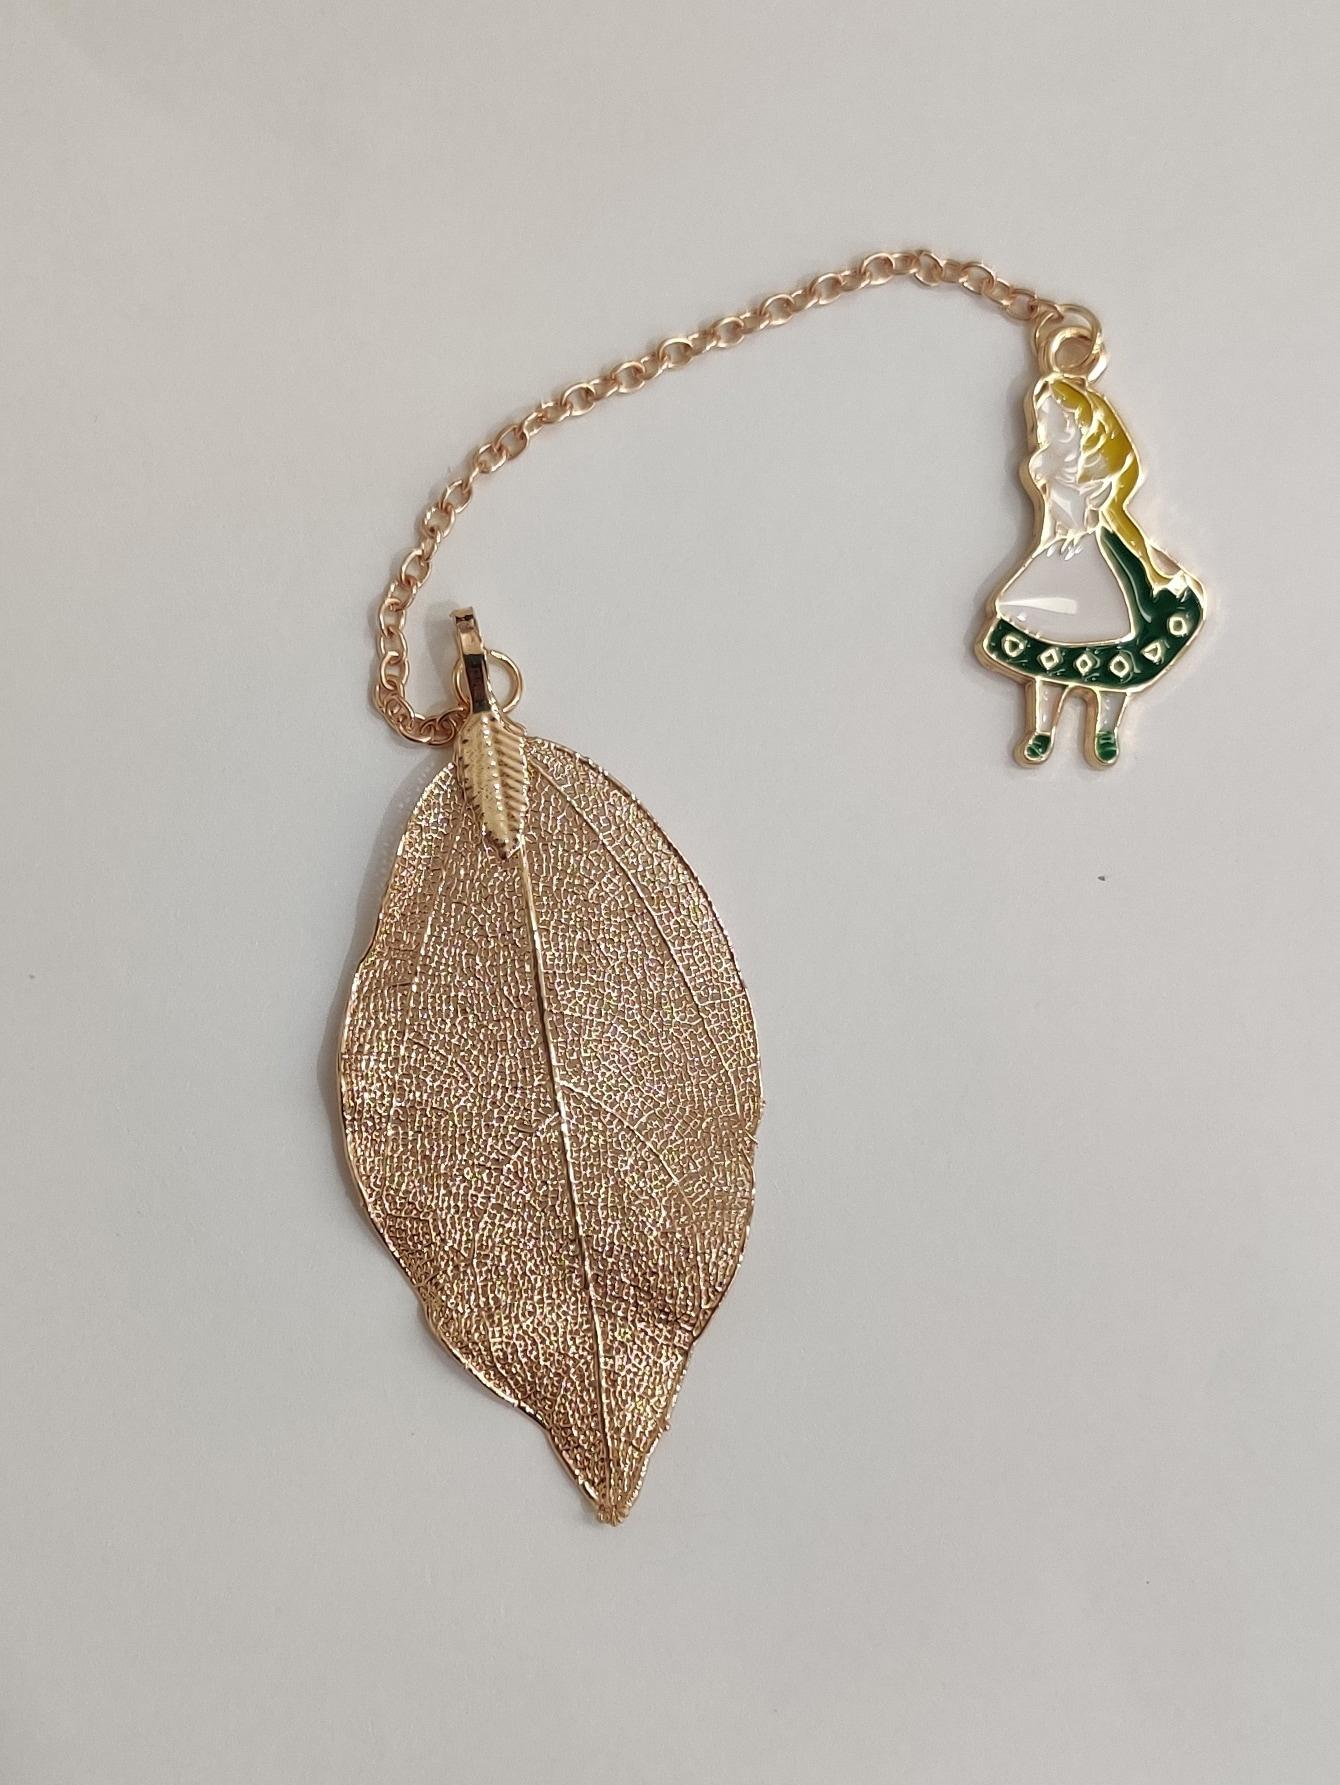 1Pc Metal Leaf Bookmark